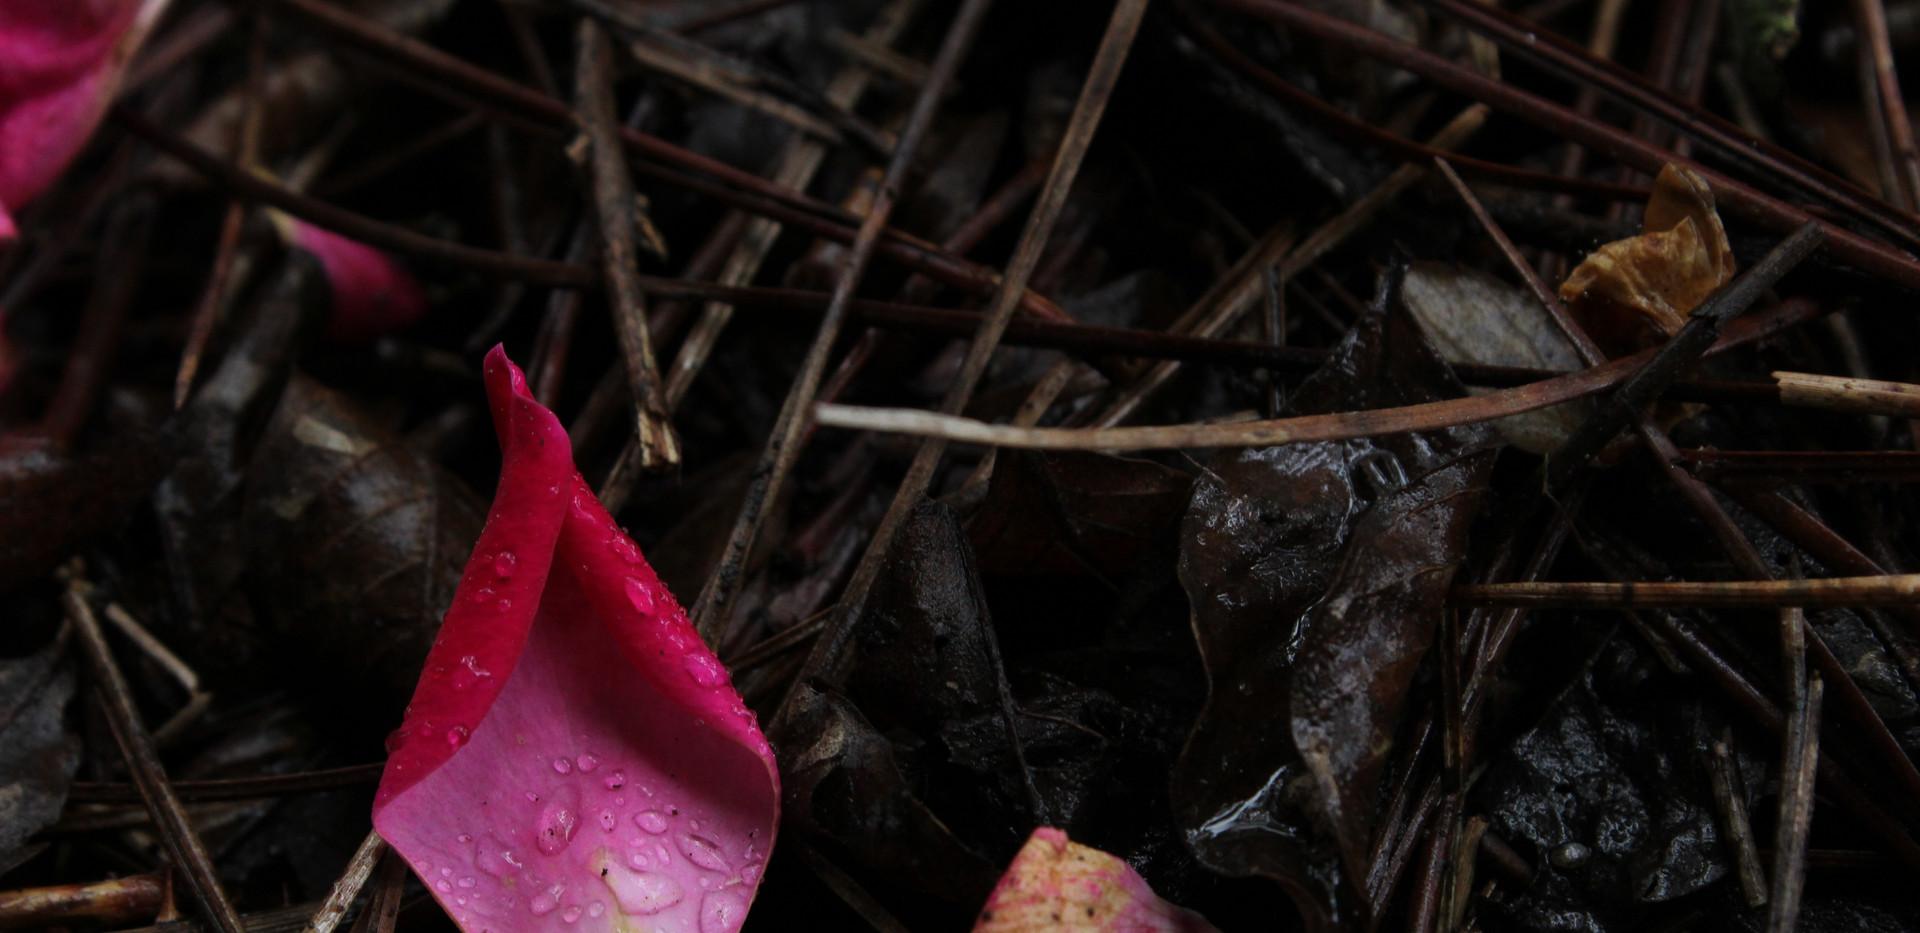 libbie flower petals on the ground wabi